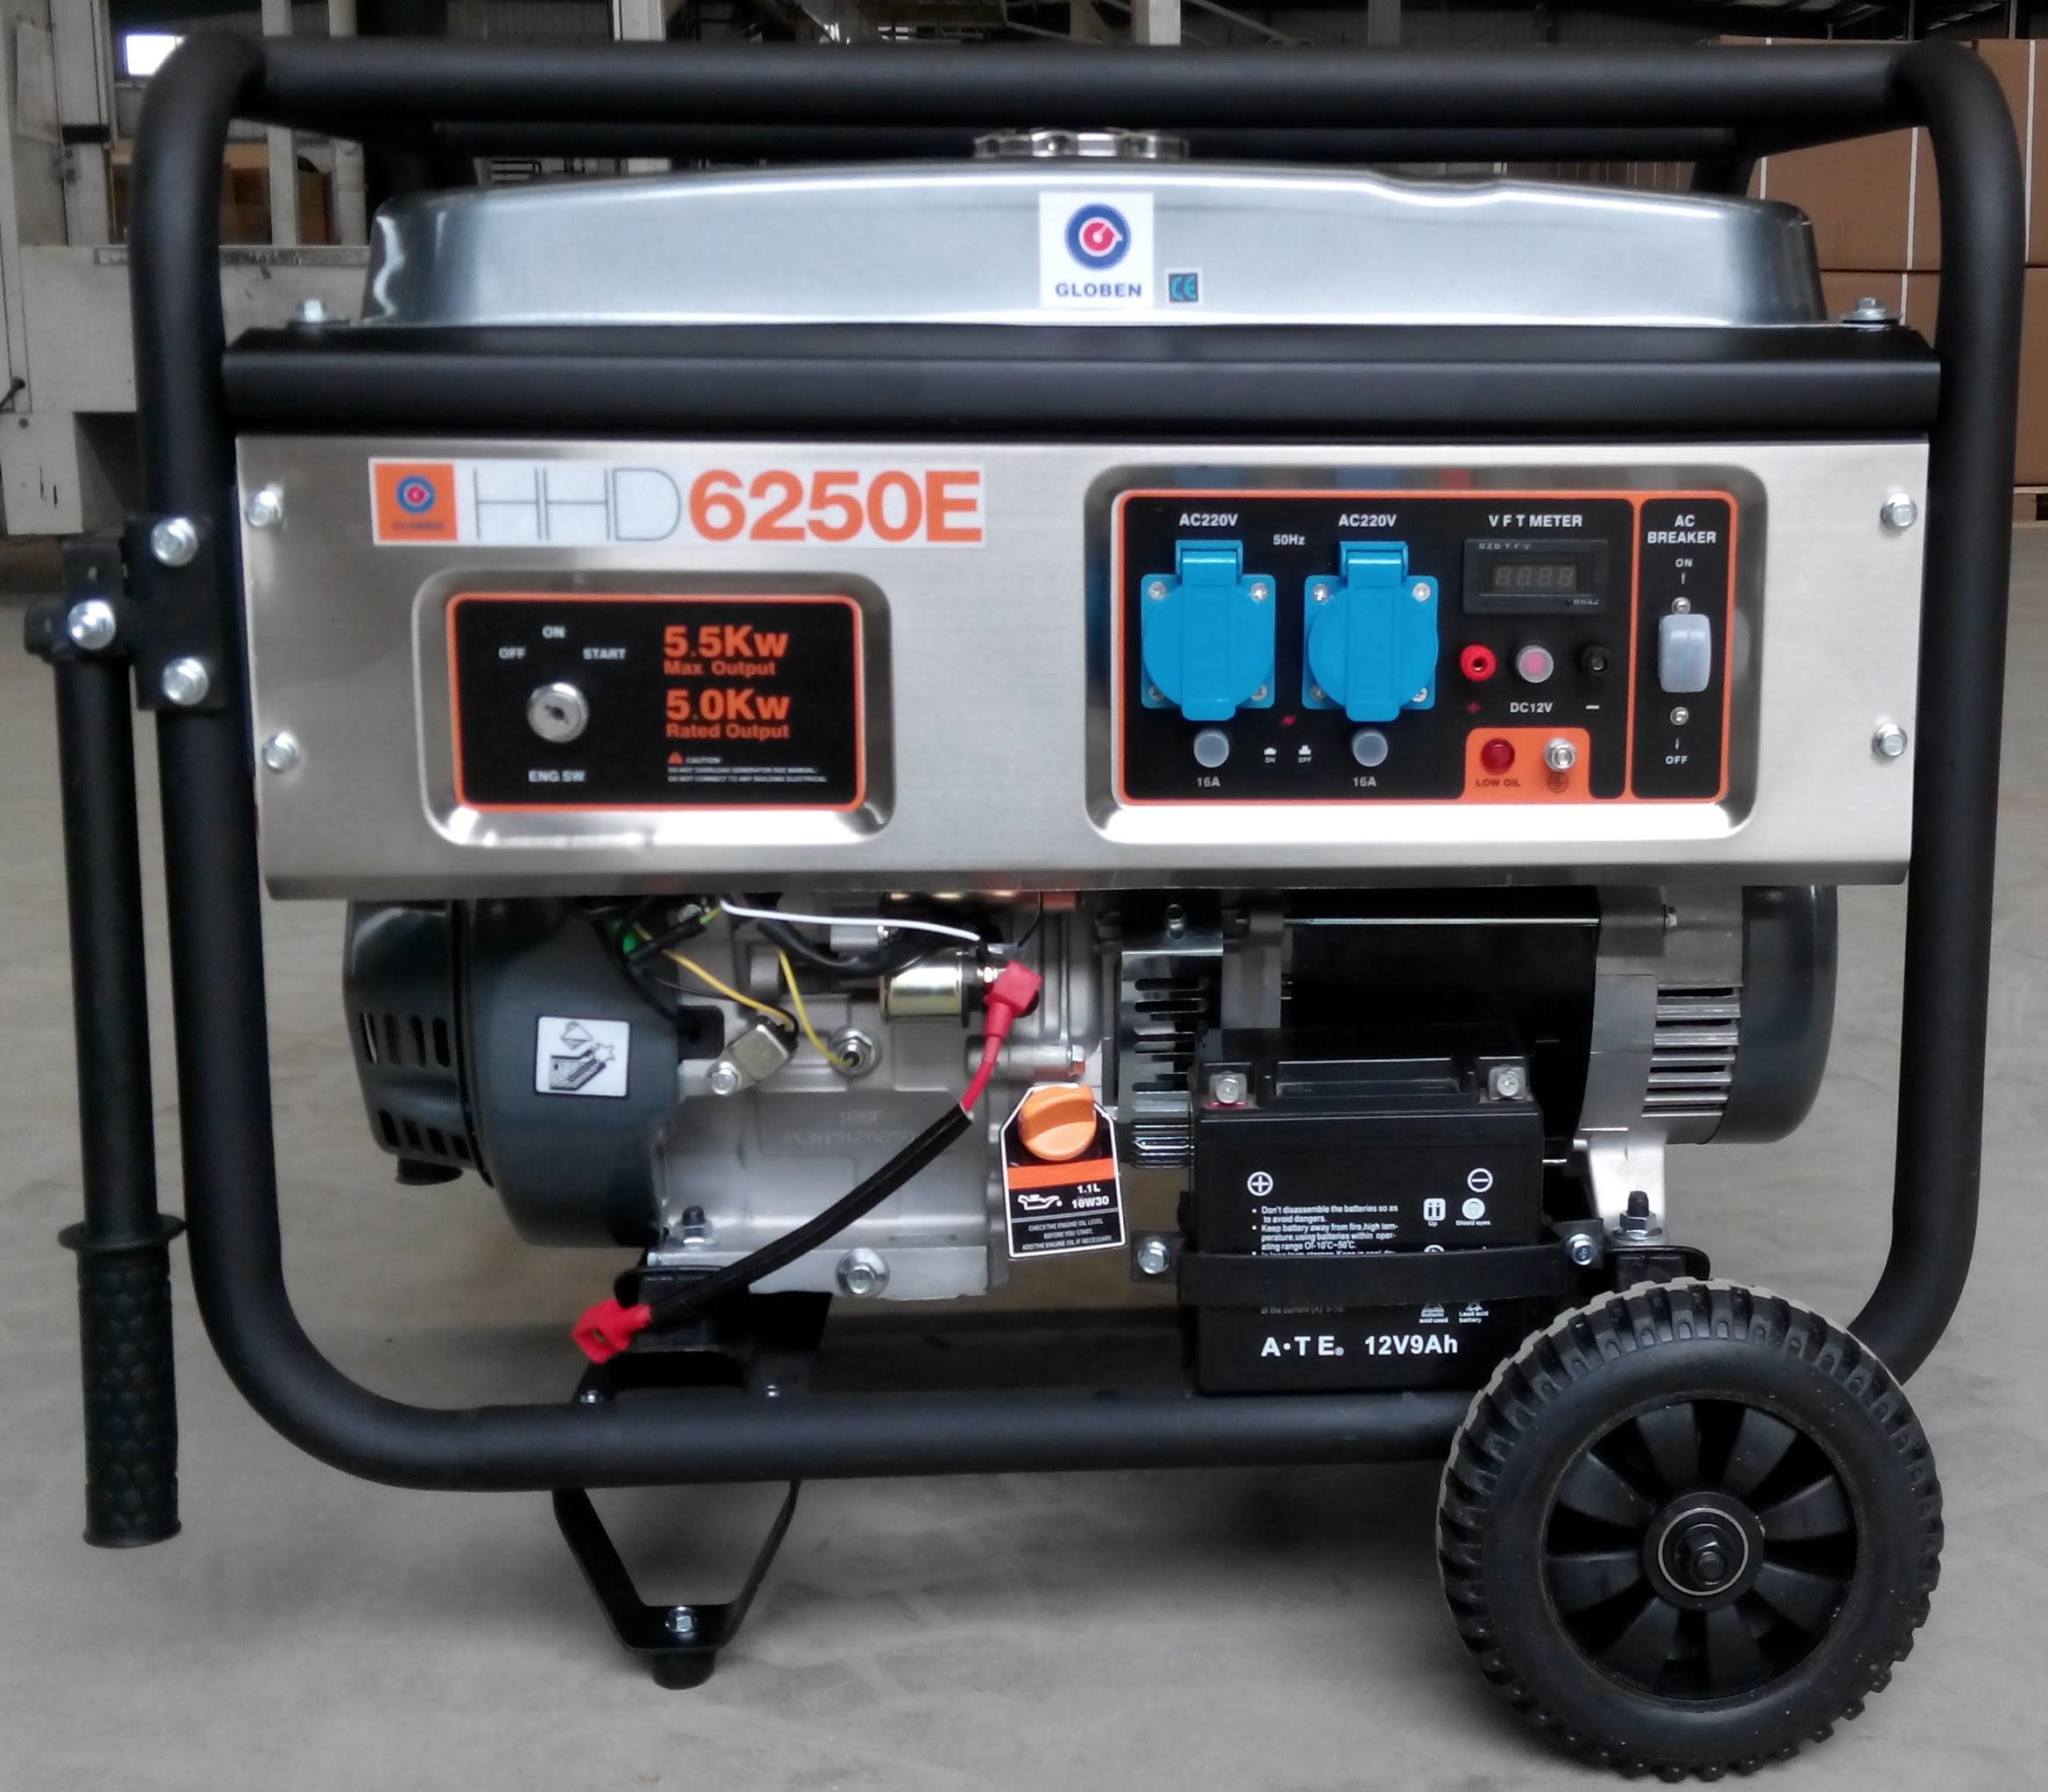 Generador gasolina HHD6250E